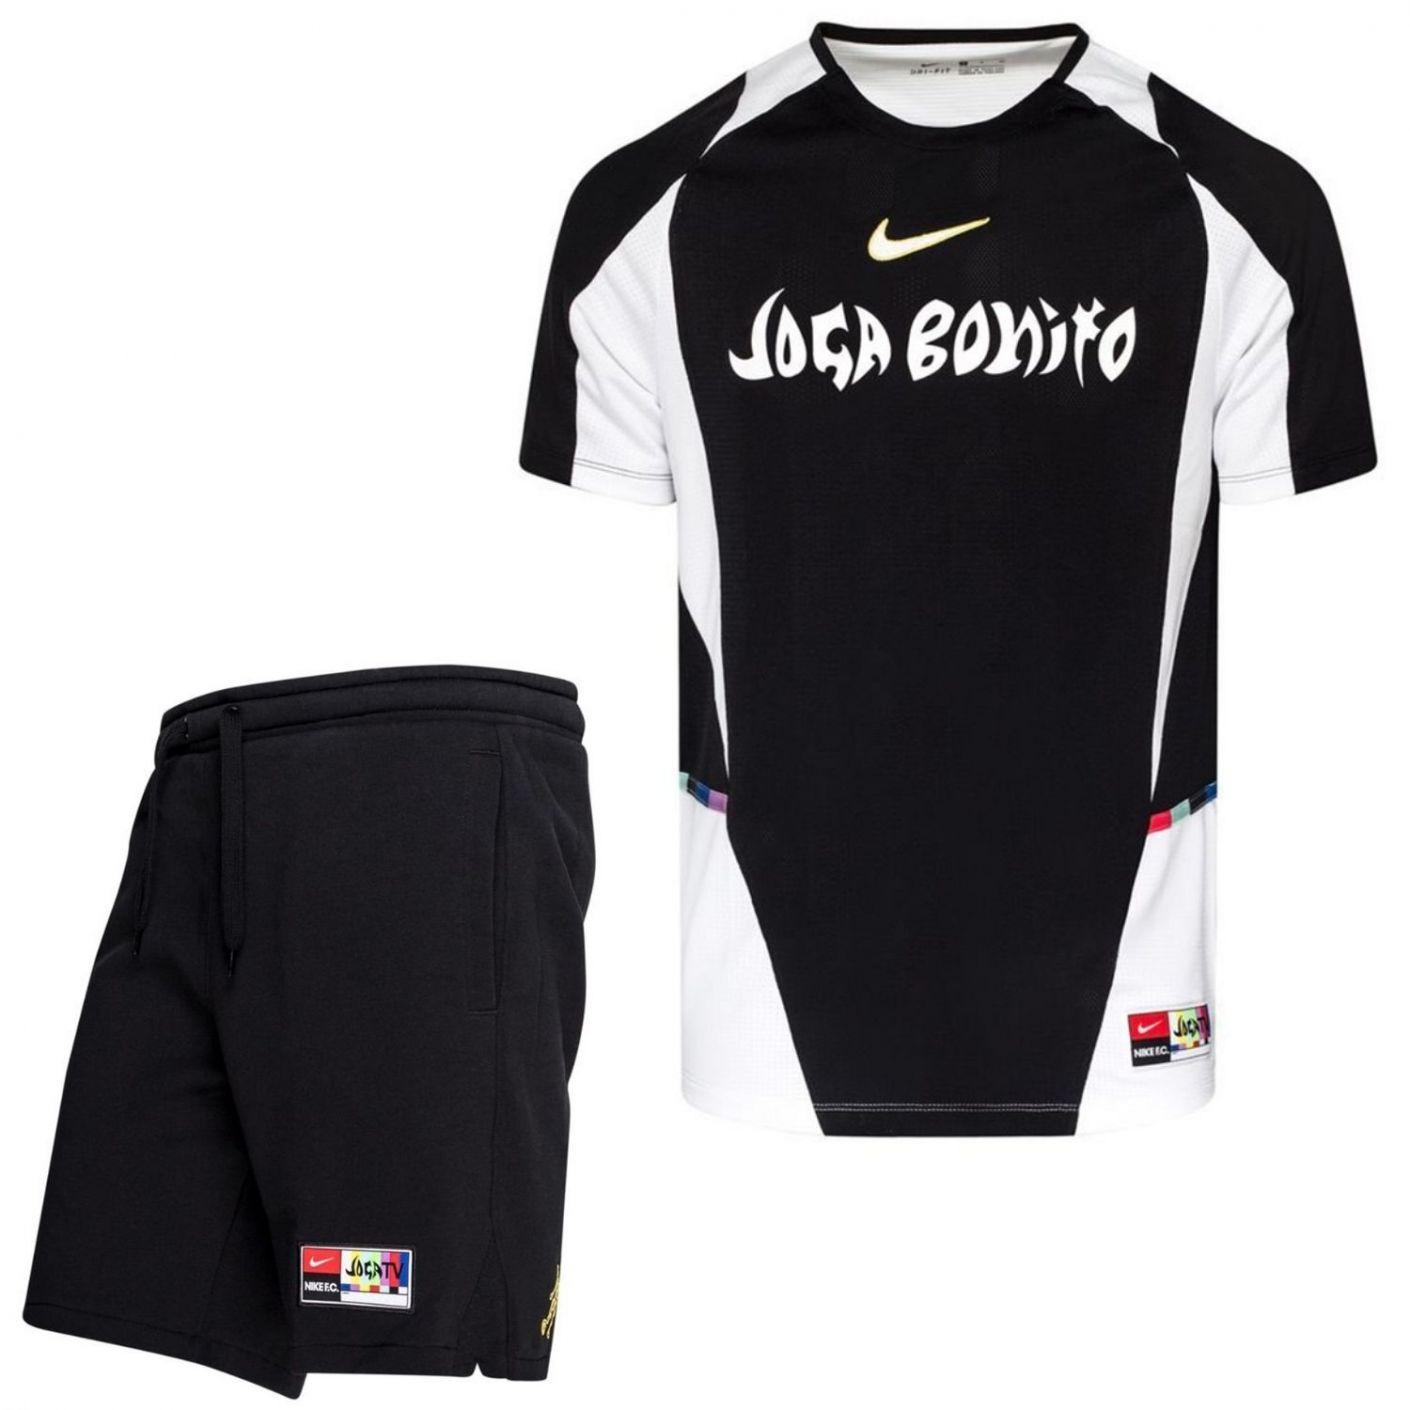 Nike F.C. Home Tenue Zwart Wit Goud